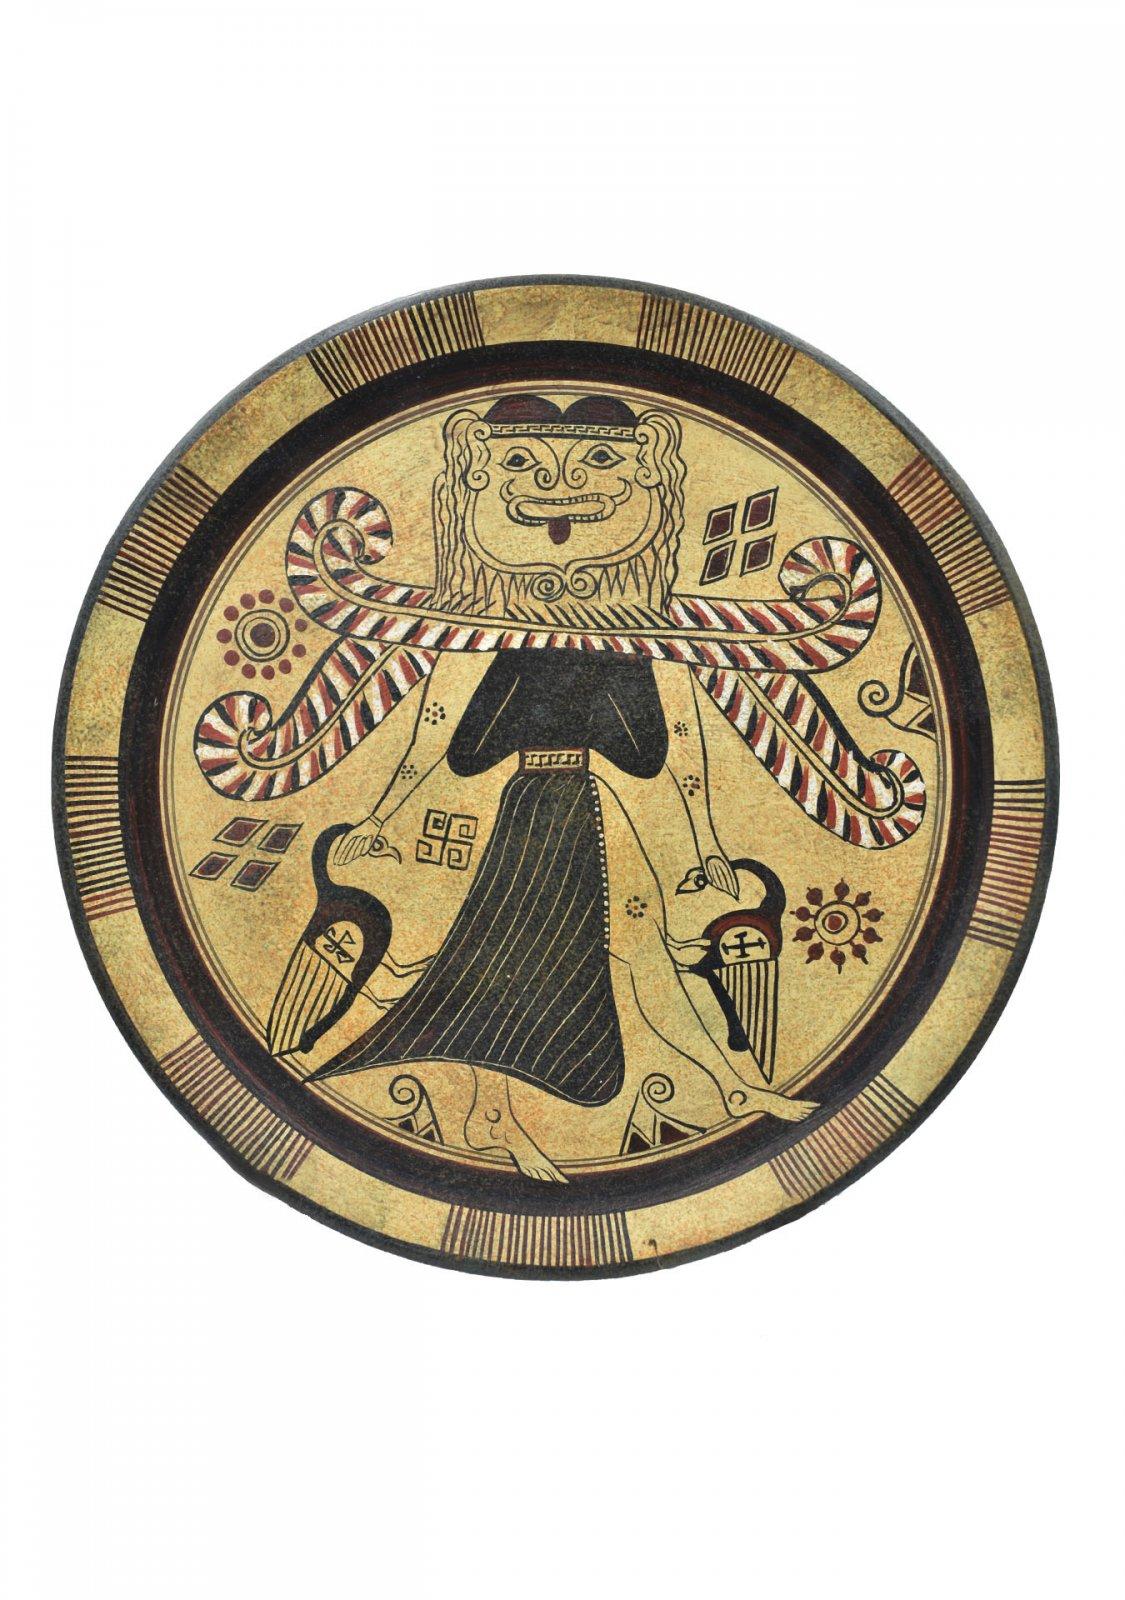 Greek ceramic plate depicting Medusa